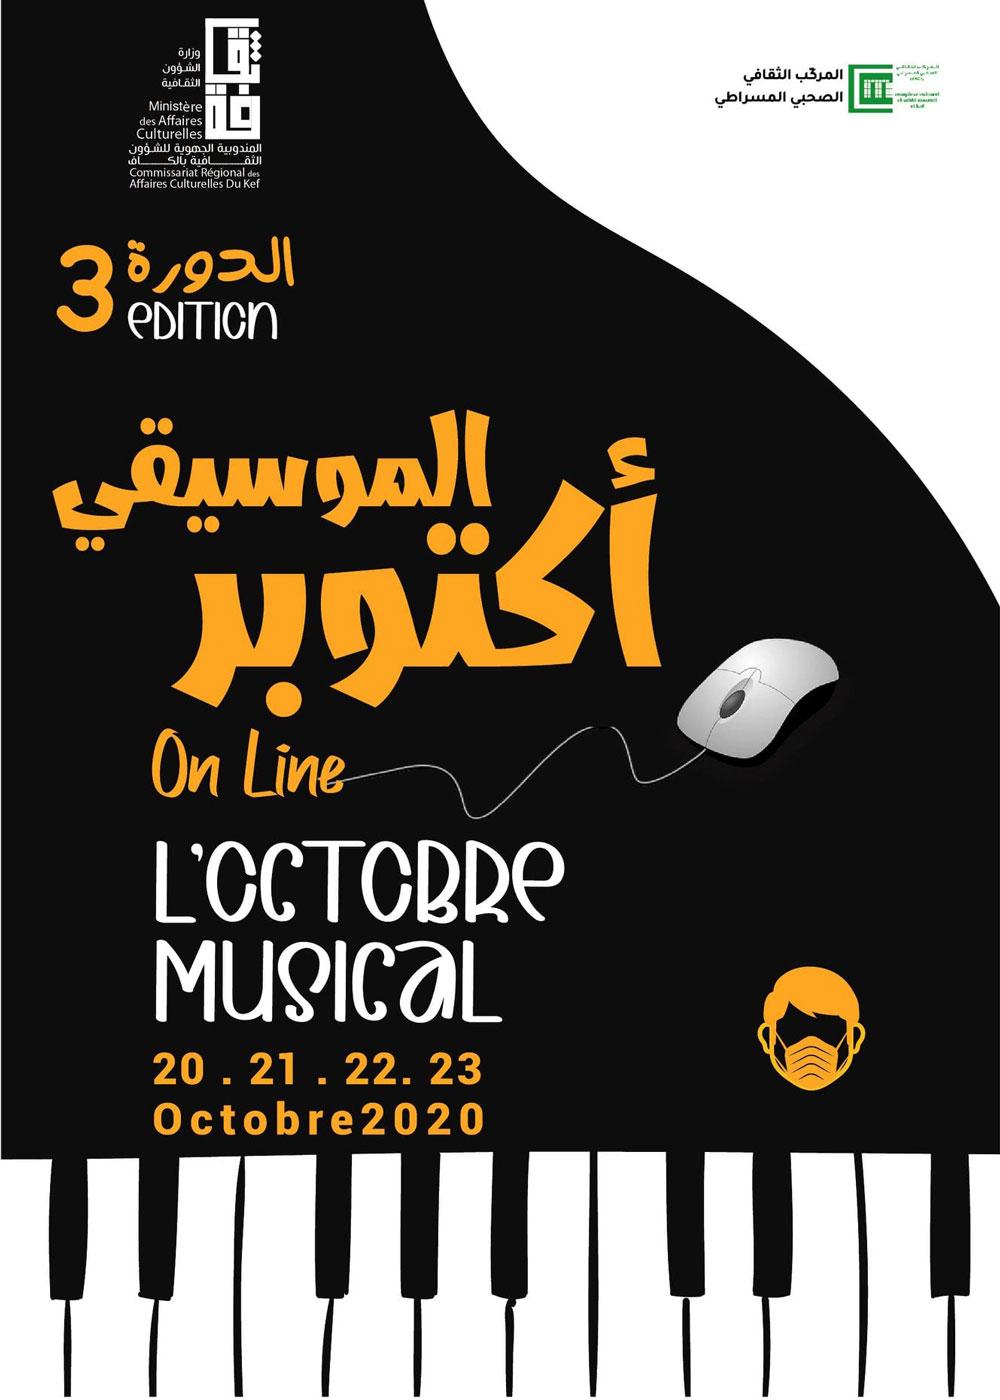 octobre-musical-081020-02.jpg